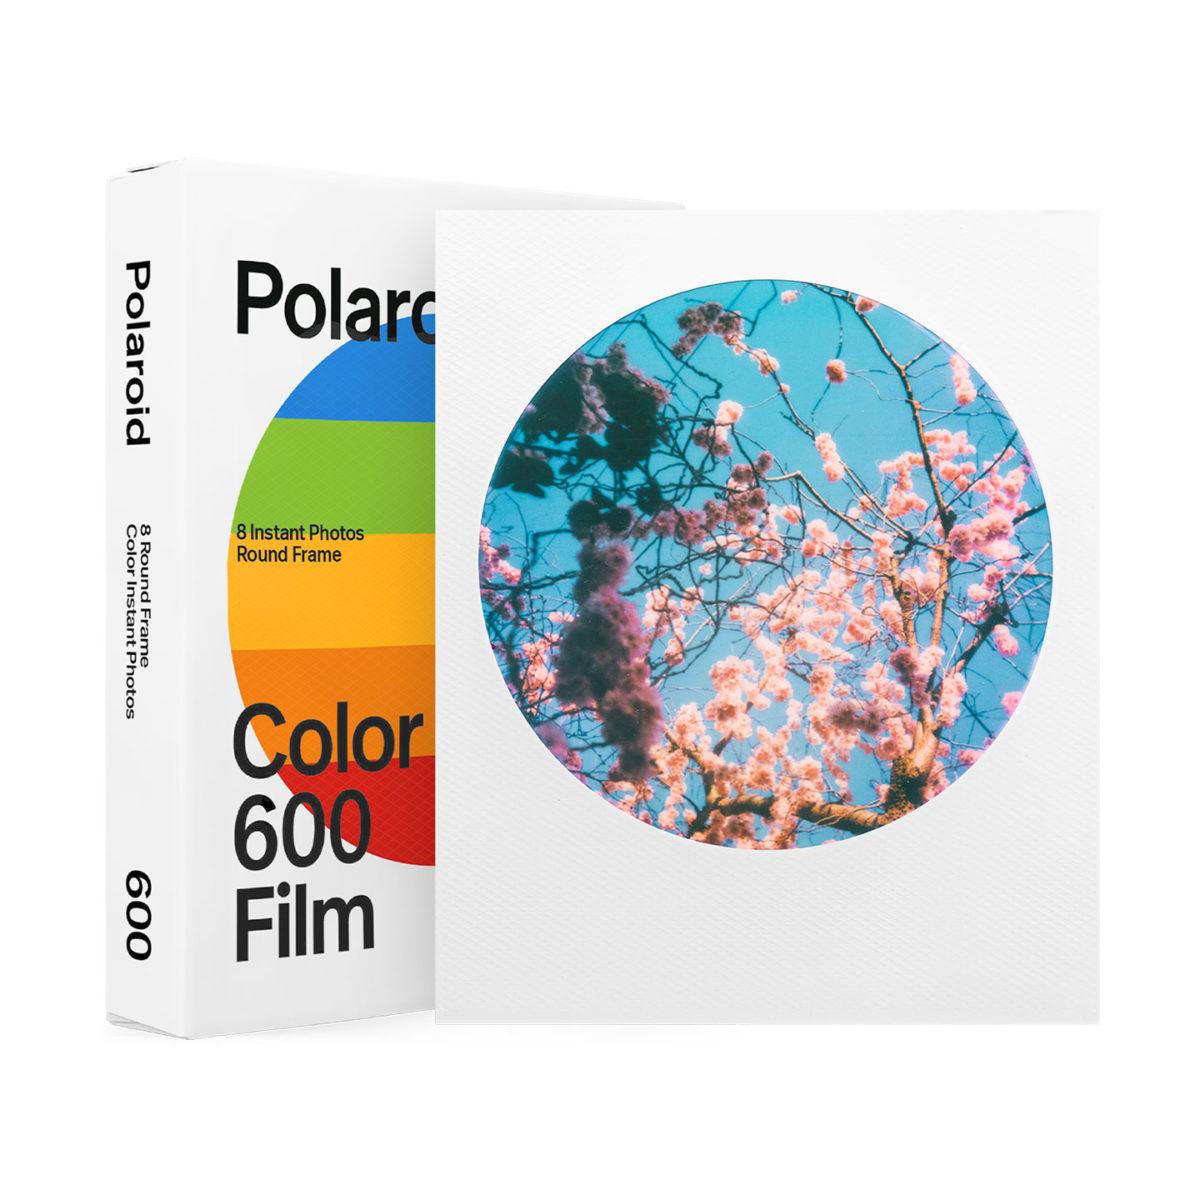 polaroid_600_color_film_round_frame_01